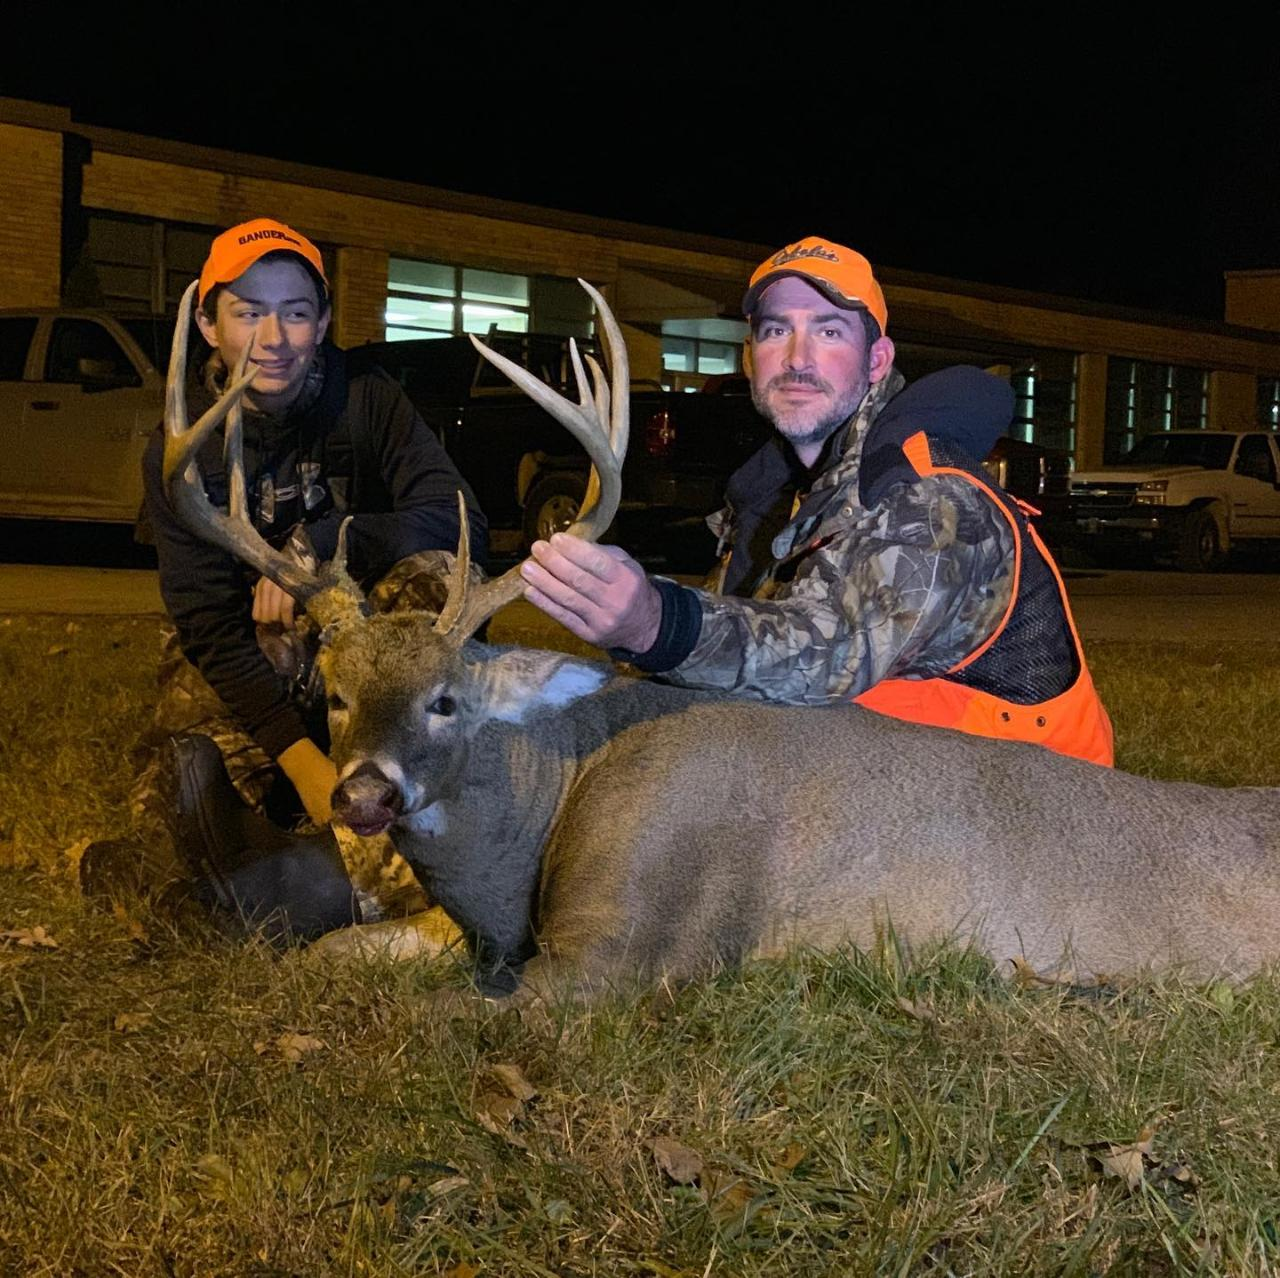 West Camp Indiana 4 Day 5 Night Muzzy Hunt